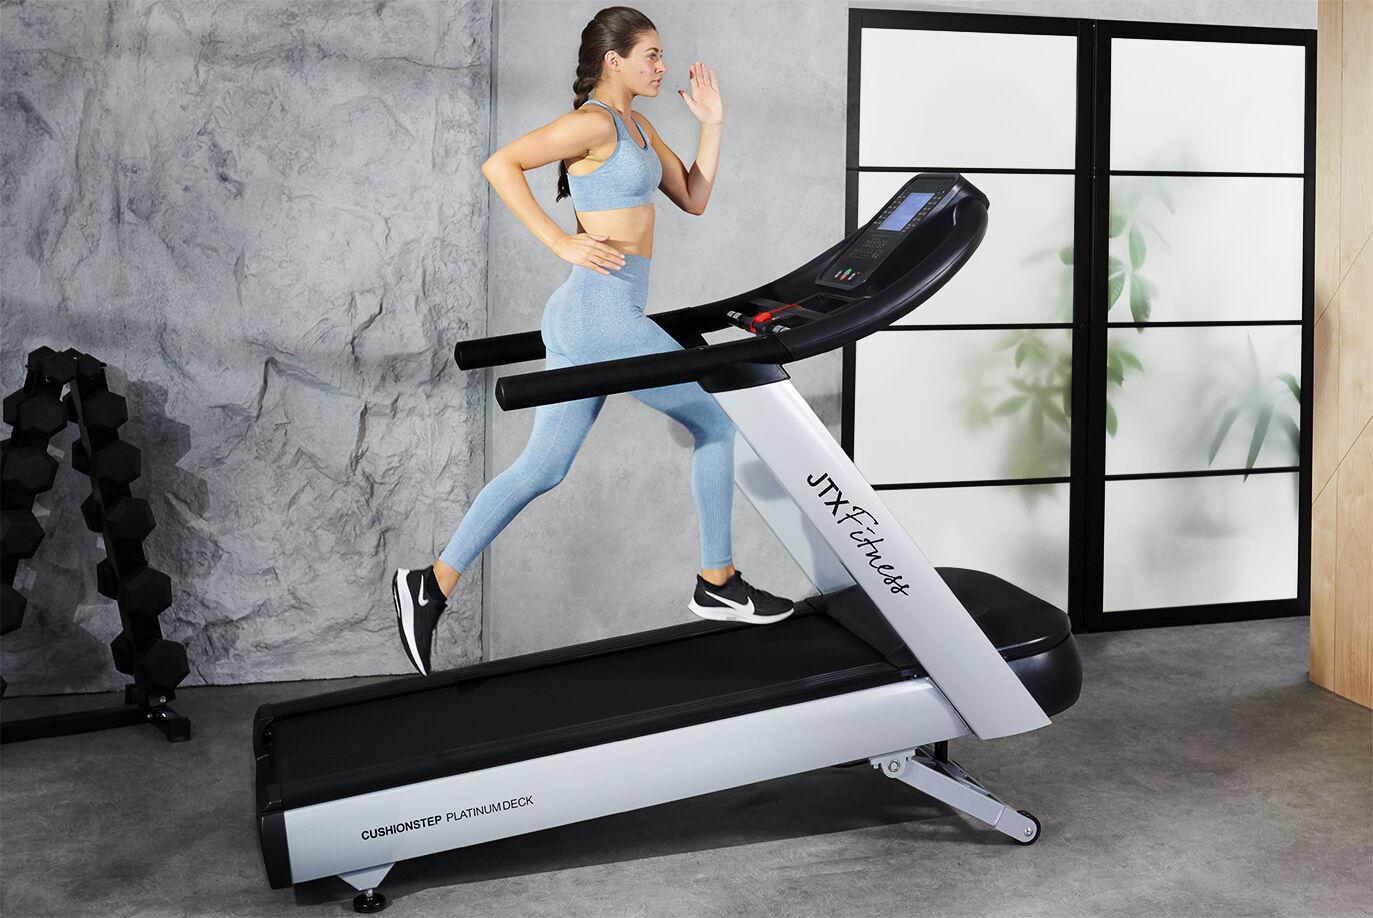 JTX Club-Max Durable Gym Treadmill